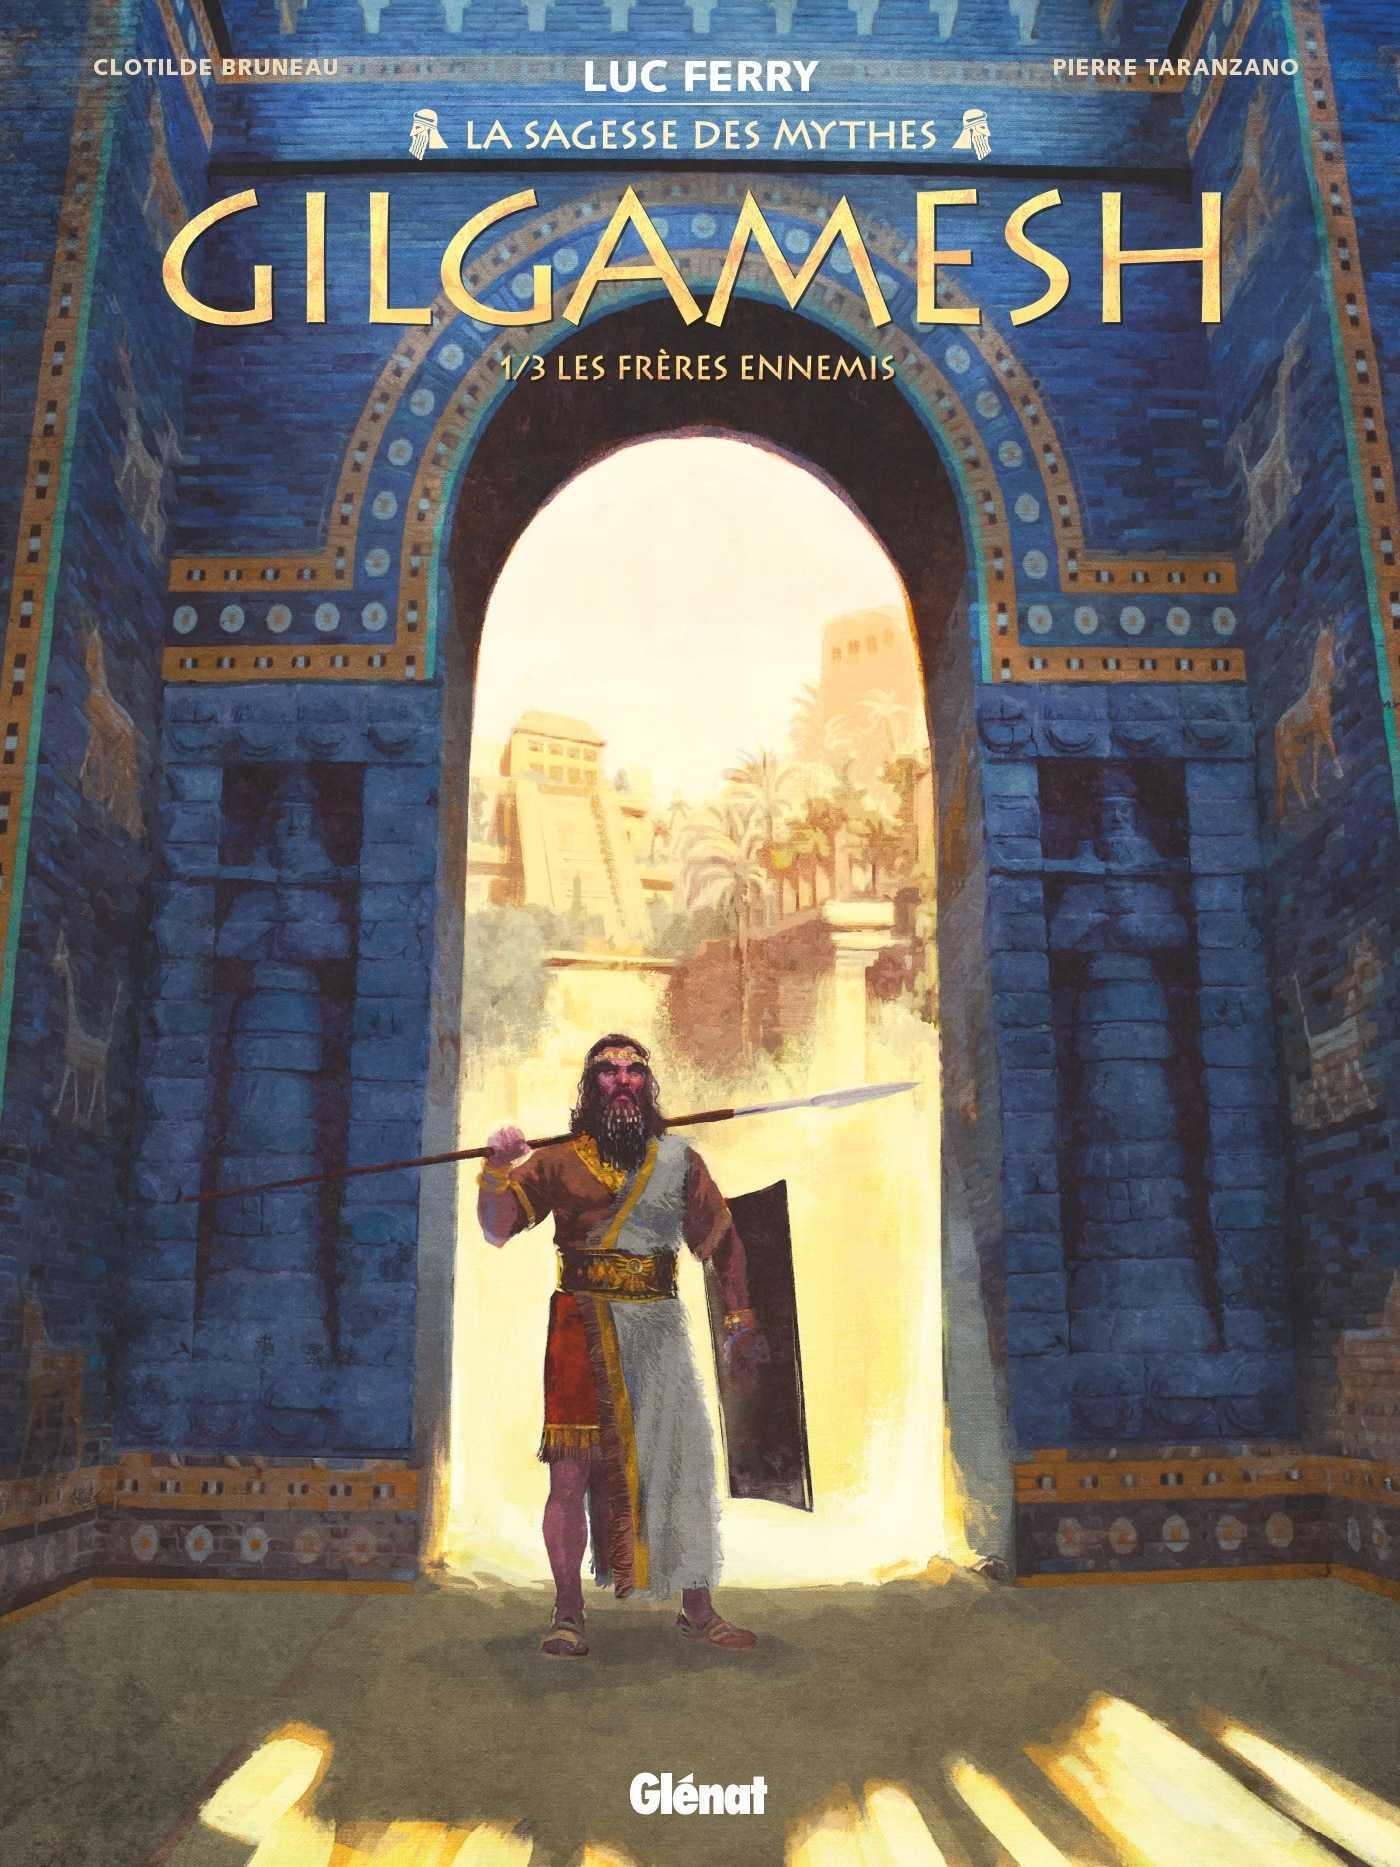 Pierre Taranzano chez Azimuts à Montpellier pour Gilgamesh le 15 novembre 2019